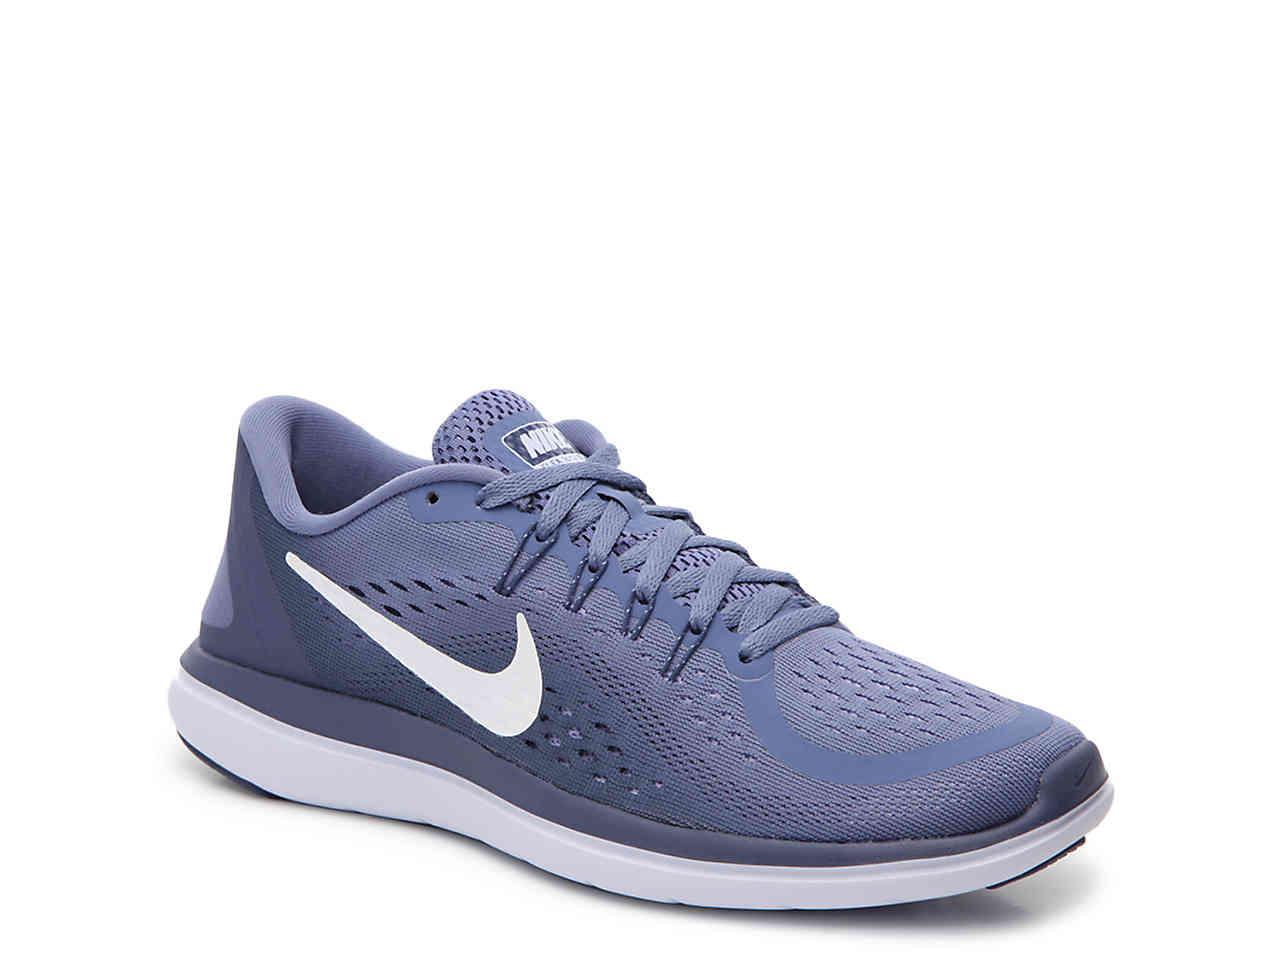 500a2111fab3 ... switzerland lyst nike flex 2017 rn lightweight running shoe in purple  592c4 90667